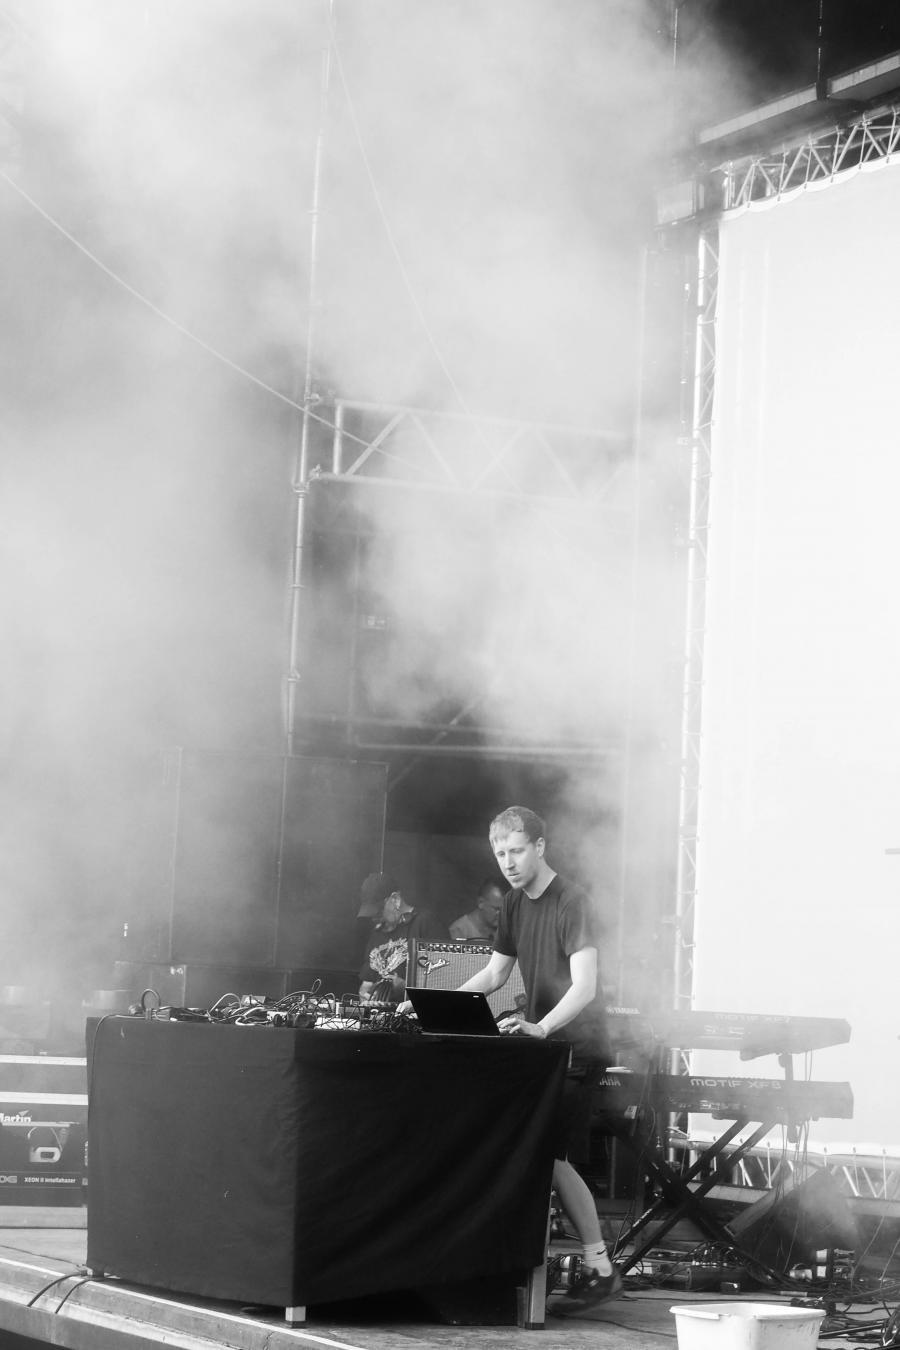 Flying Lotus / Thundercat / Dorian Concept / Jameszoo @ Arena Wien